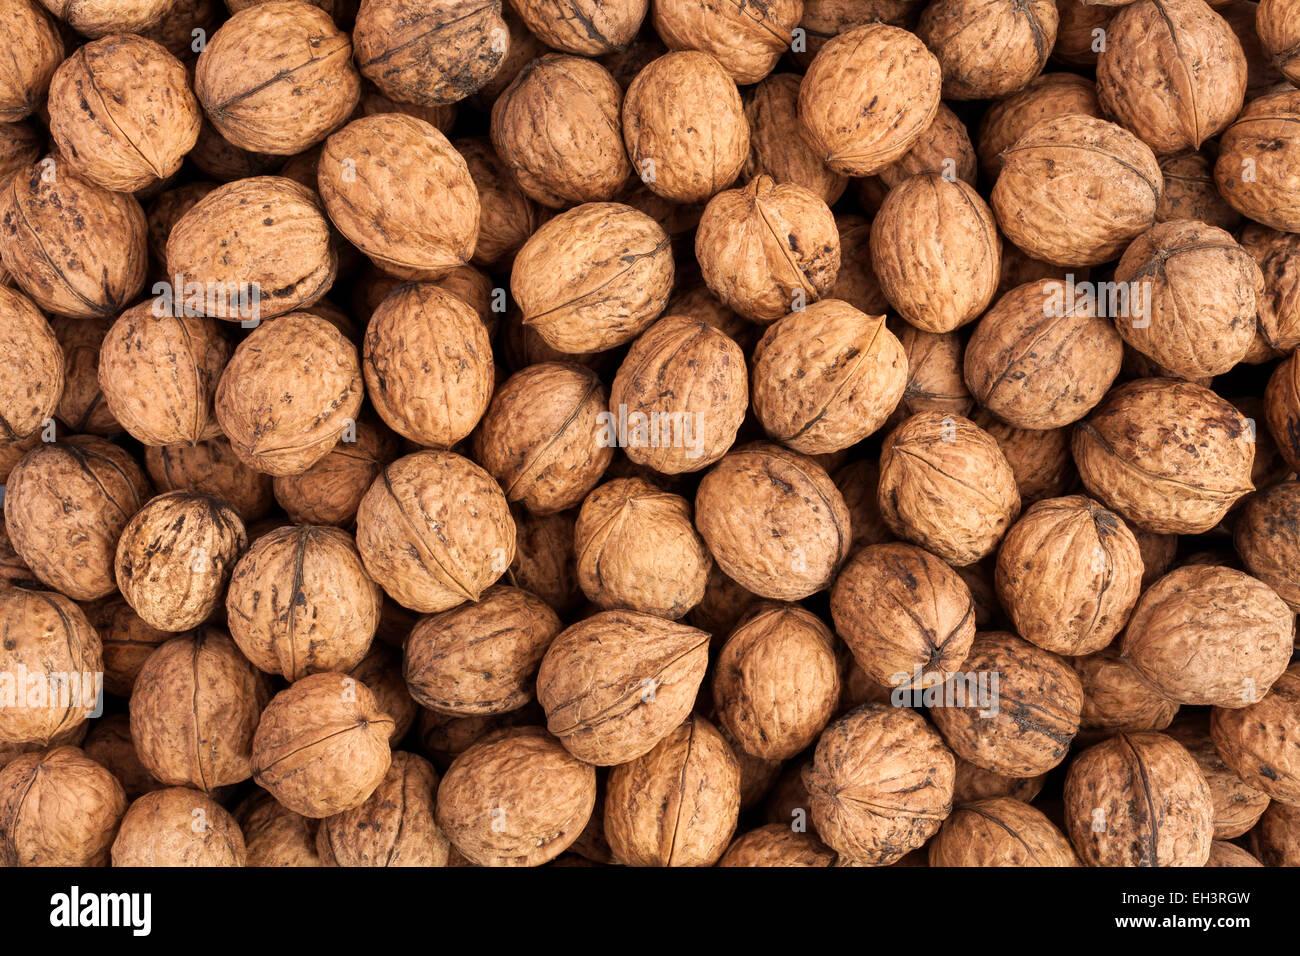 walnuts texture - Stock Image